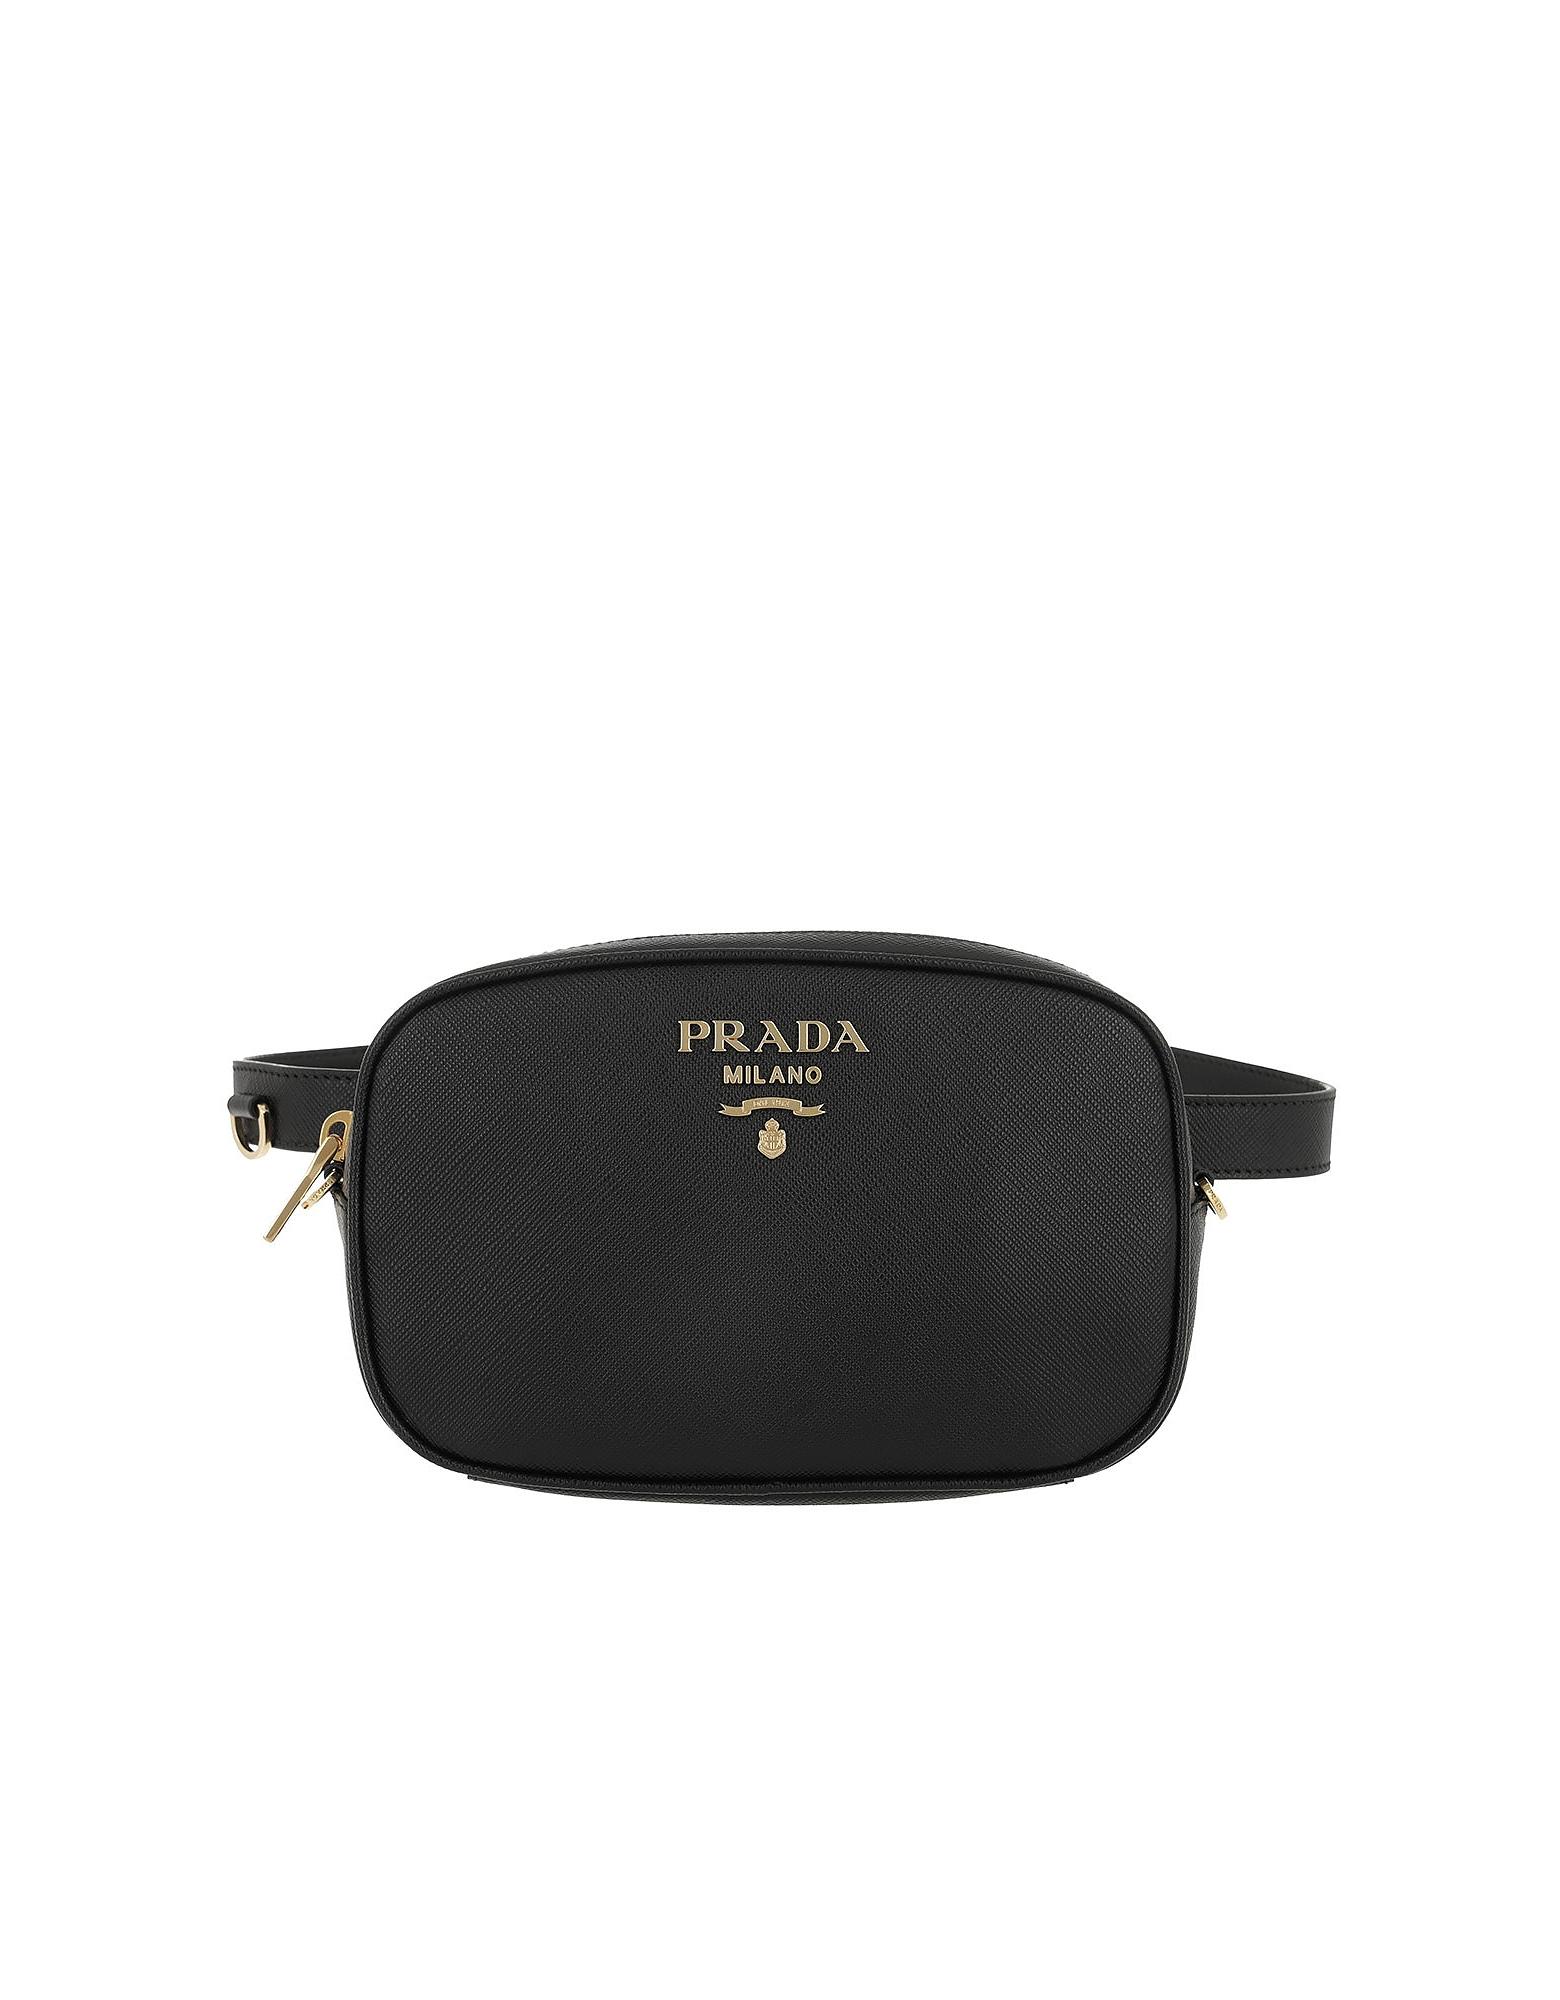 Prada Handbags, Saffiano Leather Belt Bag Black w/75 cm Strap